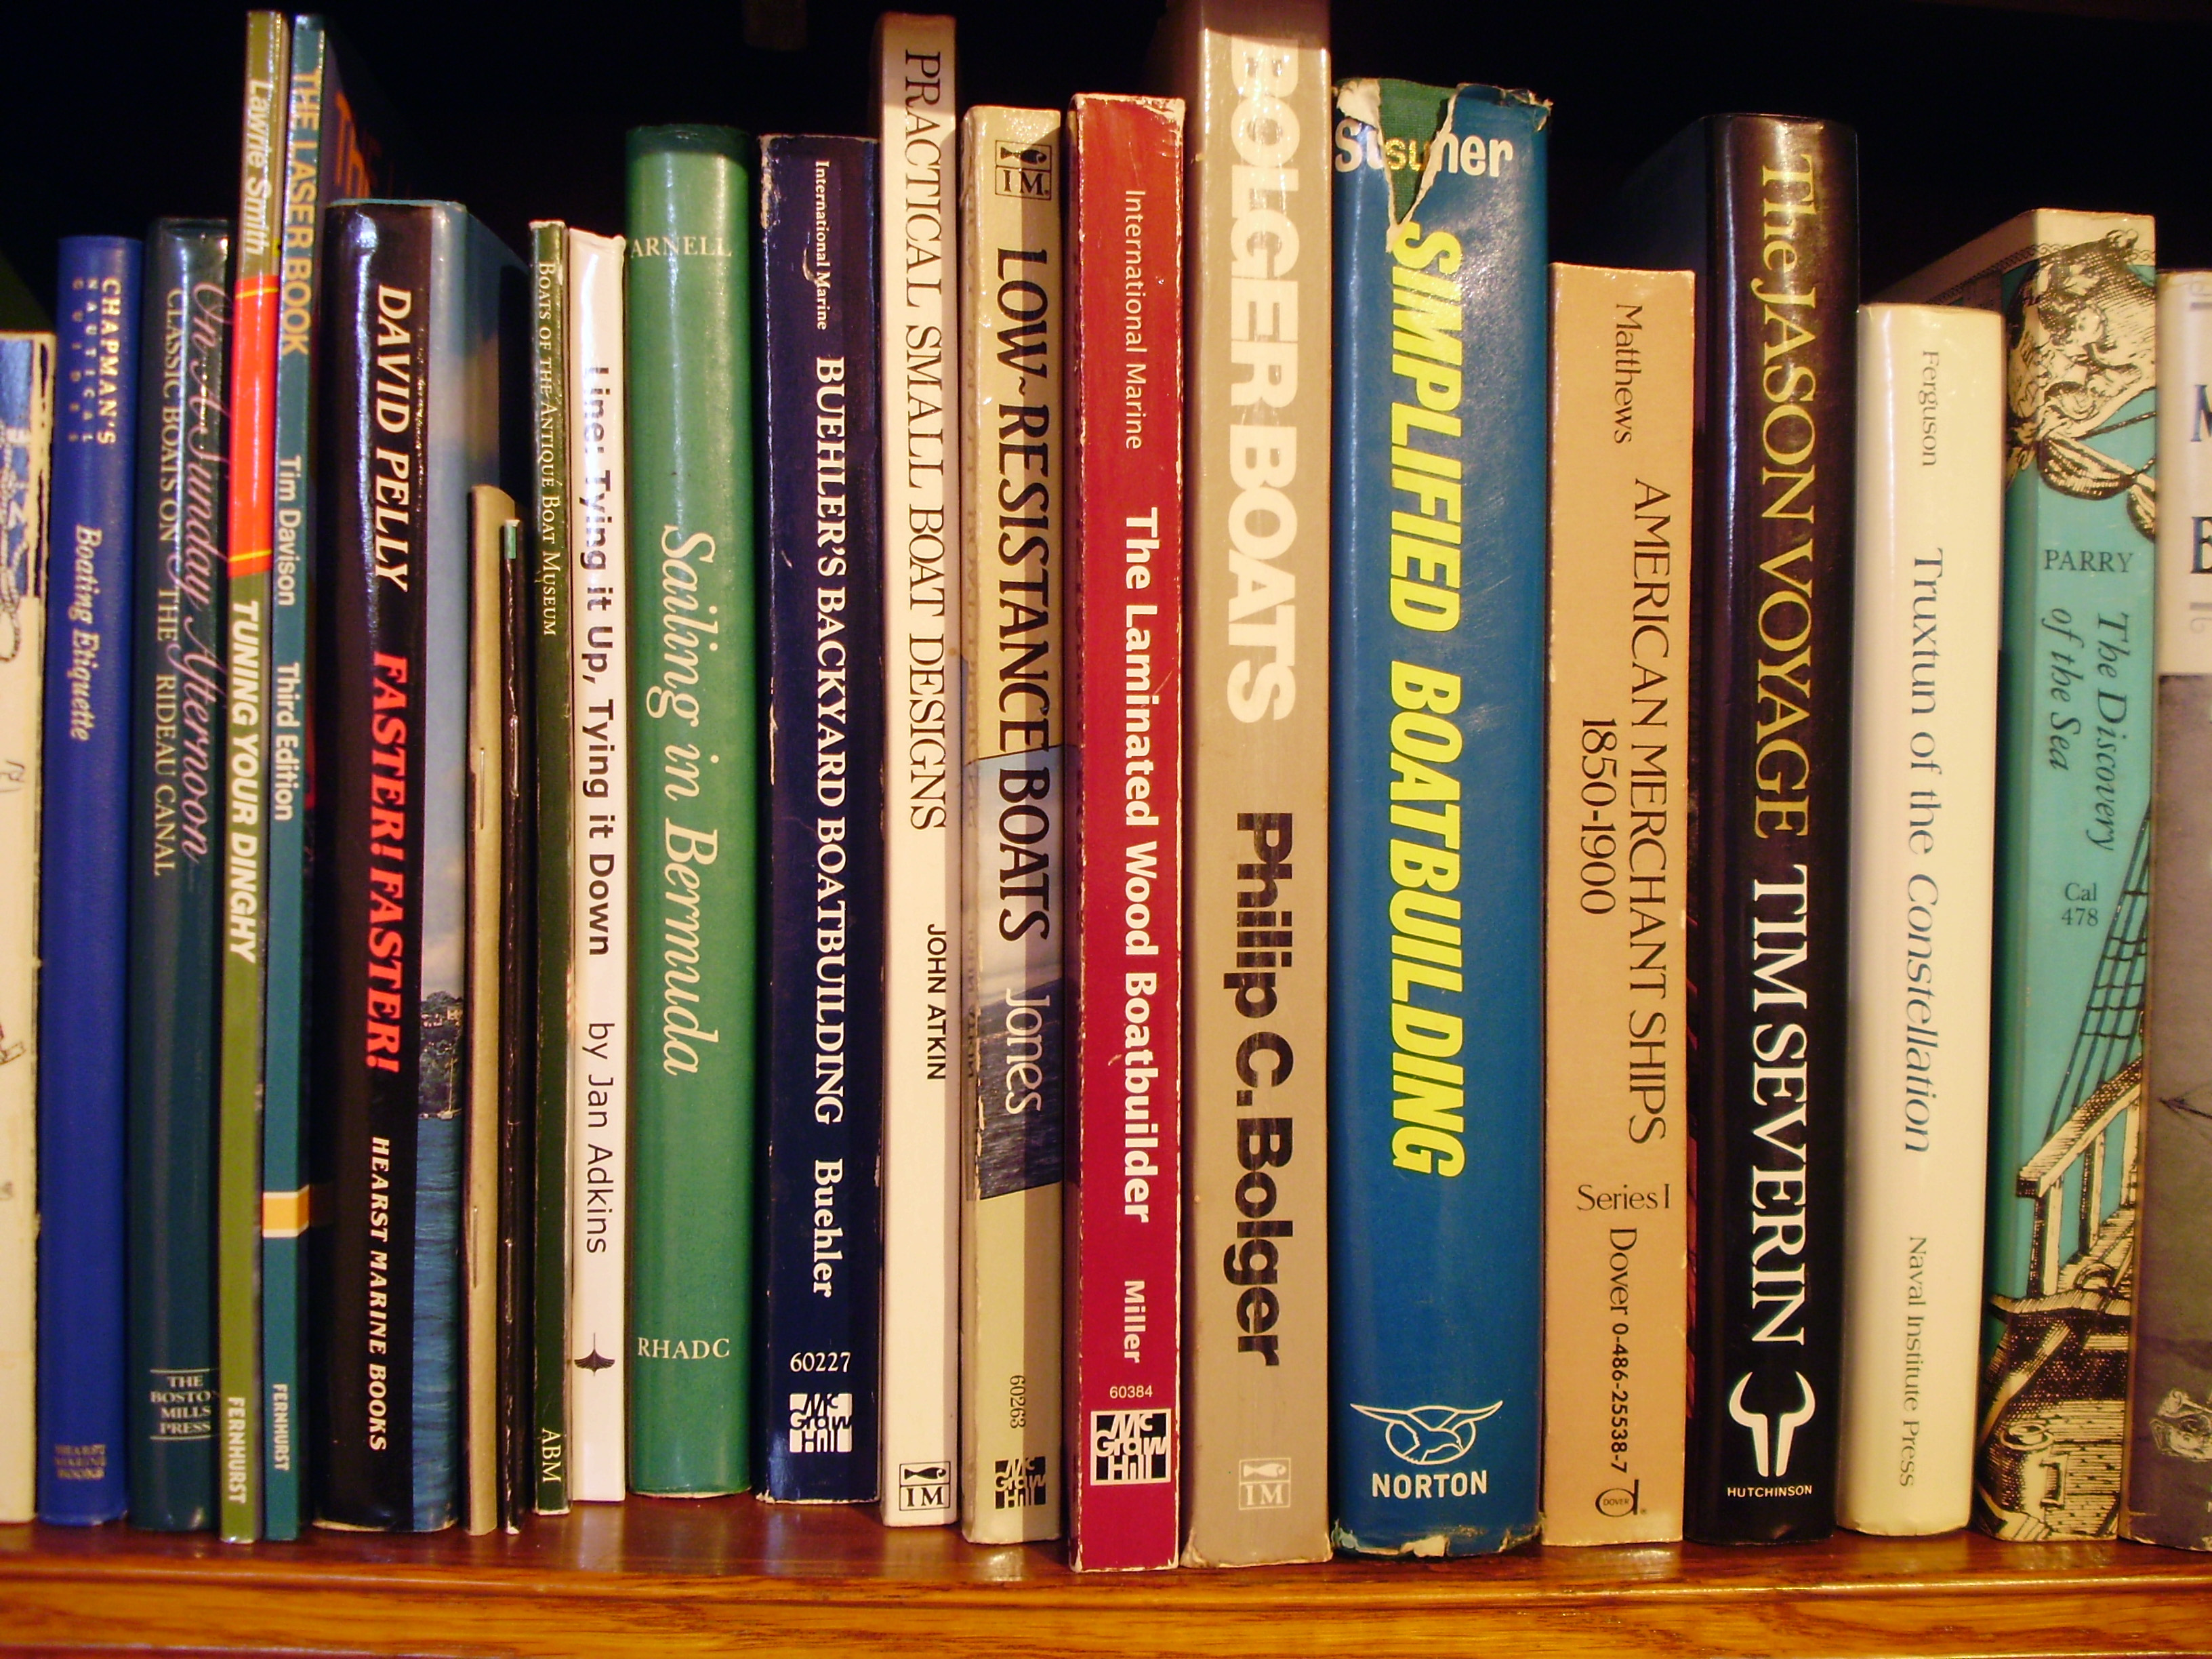 Pdf diy wooden bookshelf instructions download wooden boat plans uk woodproject - Book shelf pics ...